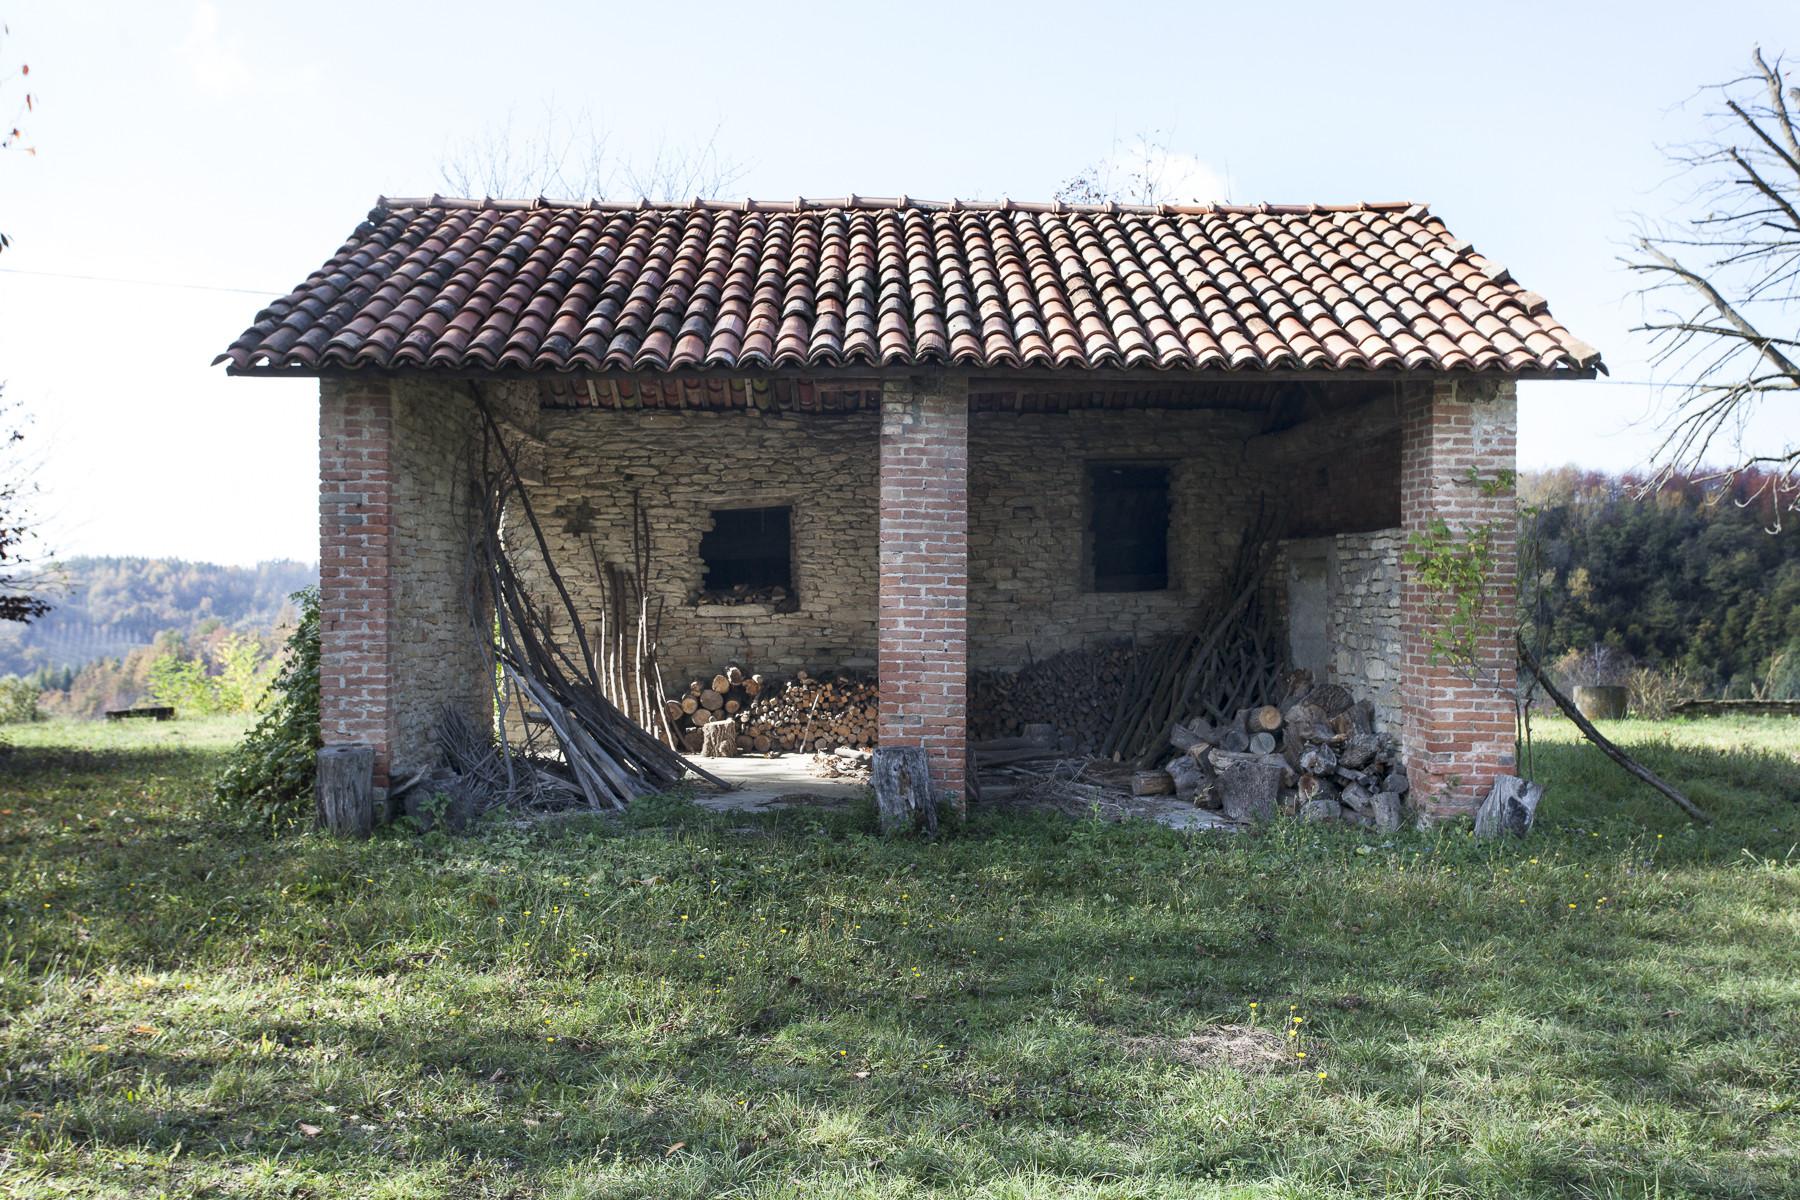 Villa in Vendita a Clavesana: 5 locali, 1130 mq - Foto 4